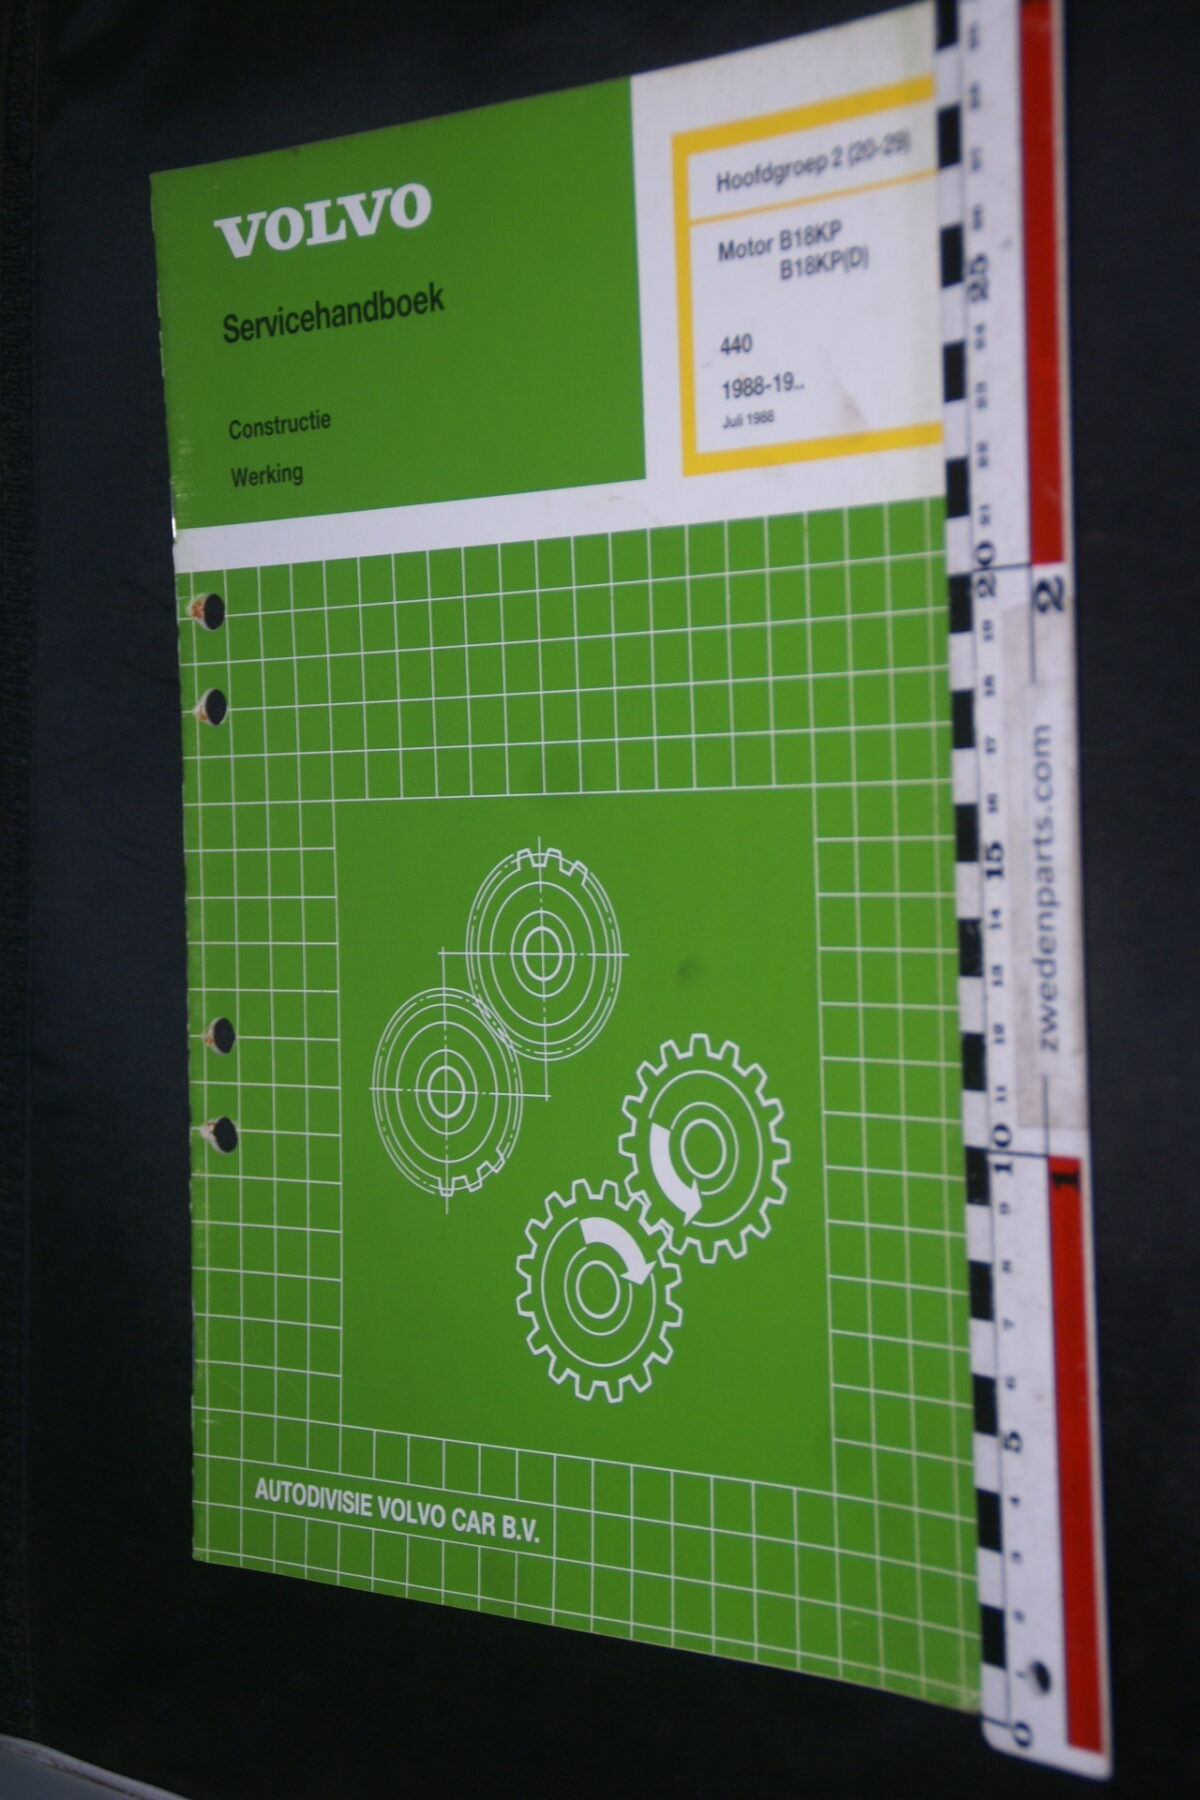 DSC09415 1988 origineel werkplaatsboek 2 (20-29) motor Volvo 440 1 van 1.500 nr TP 35503-1